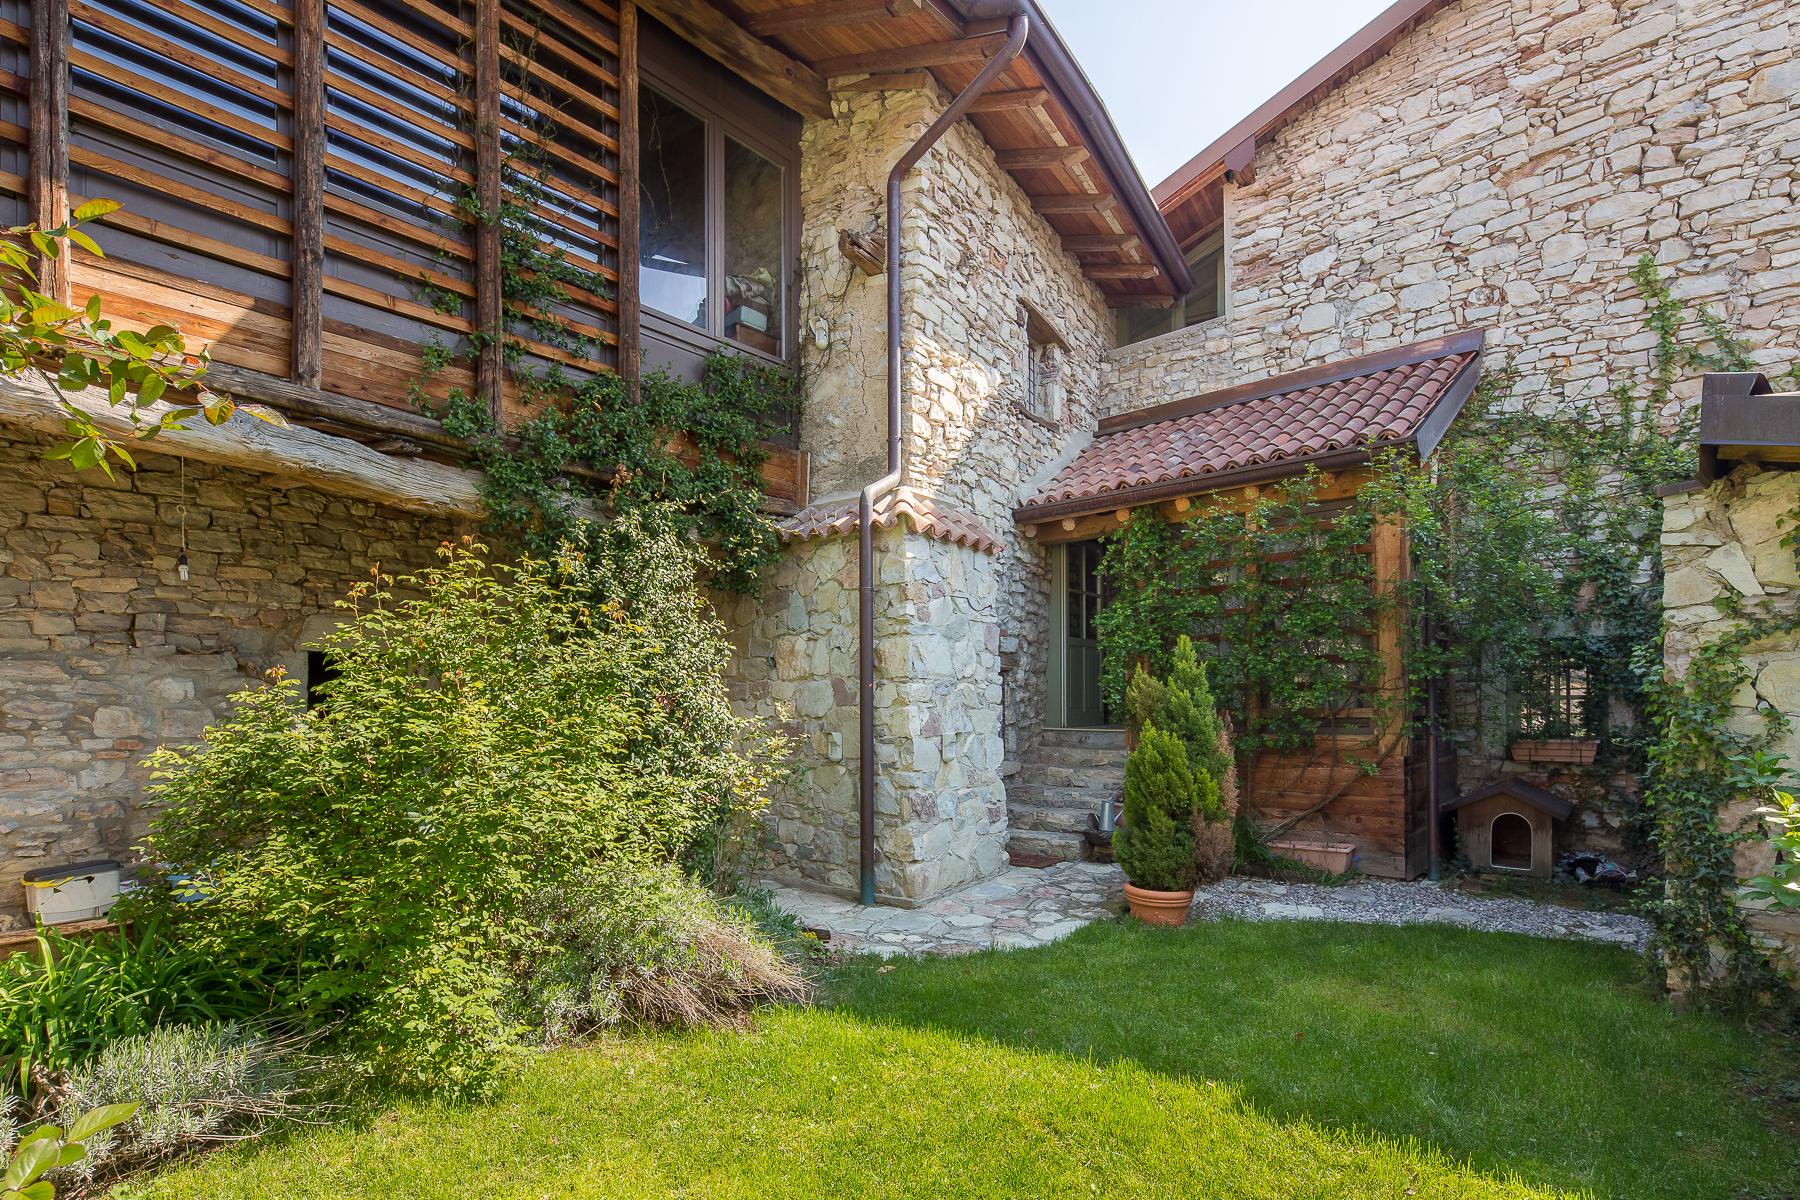 Casa indipendente in Vendita a Caprino Bergamasco: 5 locali, 500 mq - Foto 3